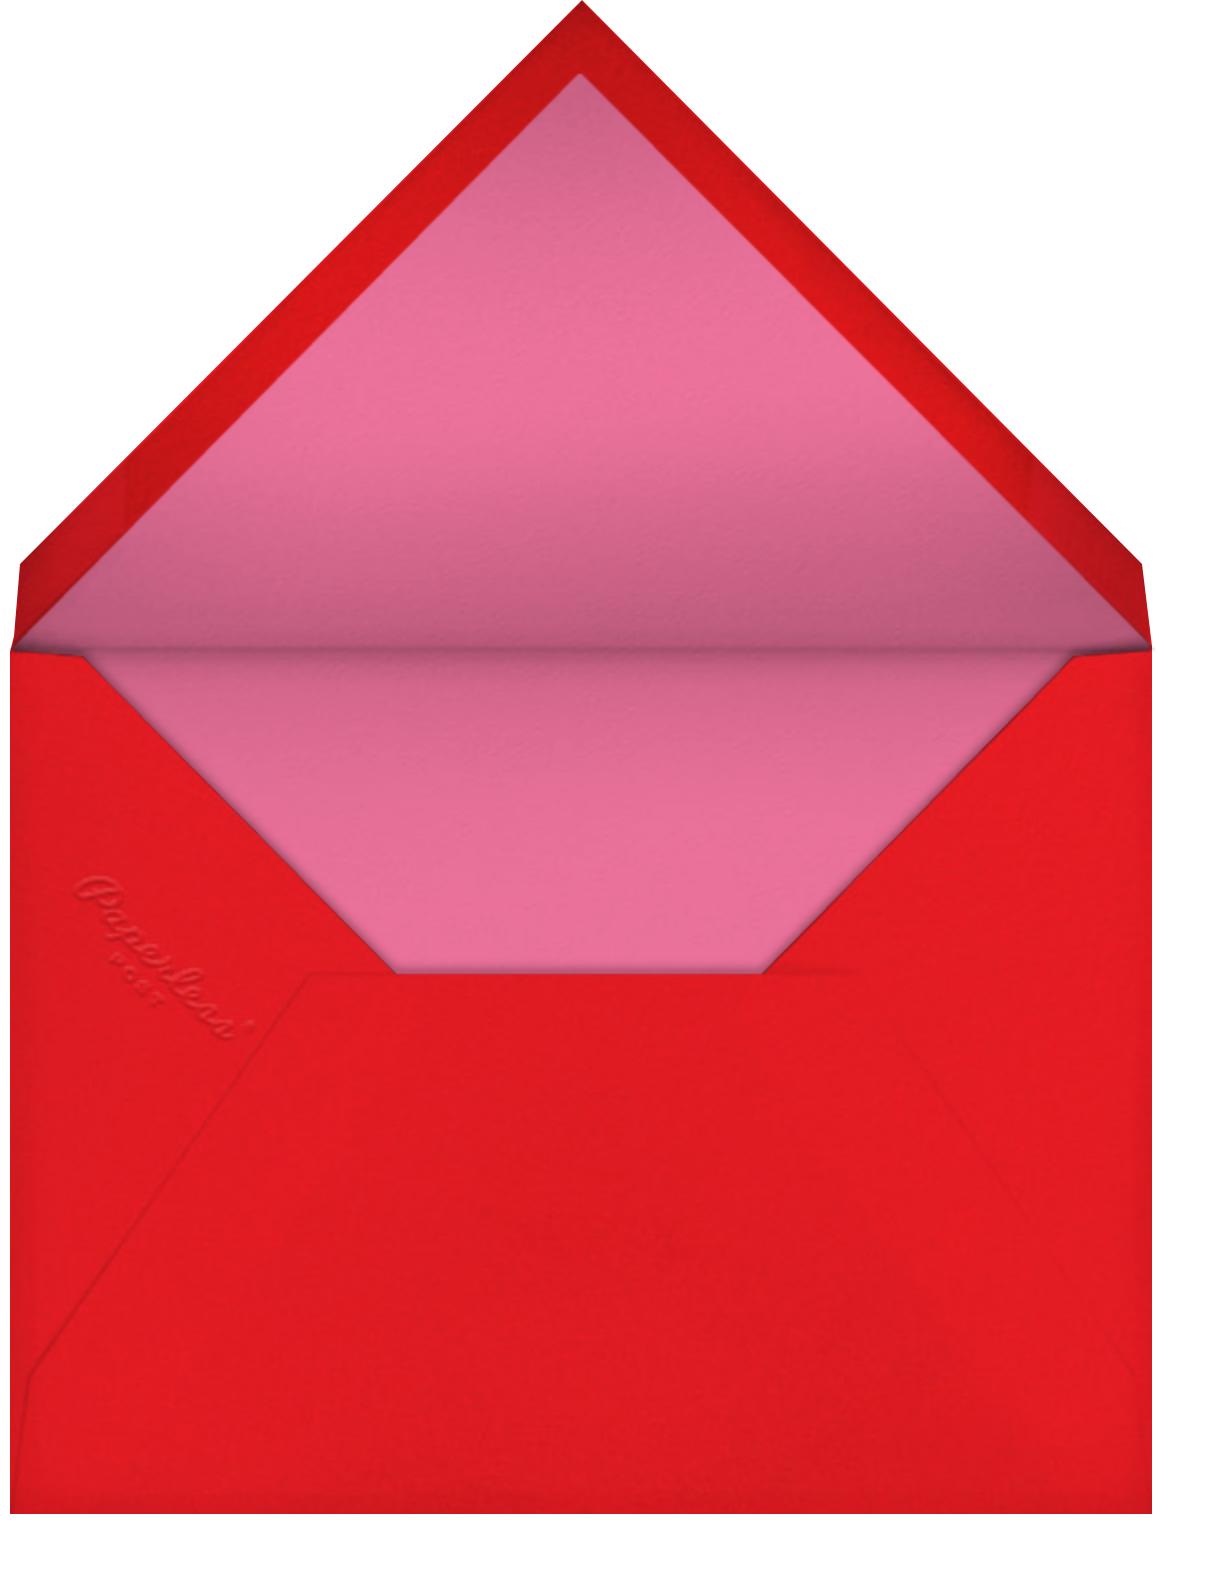 Queen of Diamonds (Danielle Kroll) - Light - Red Cap Cards - Envelope